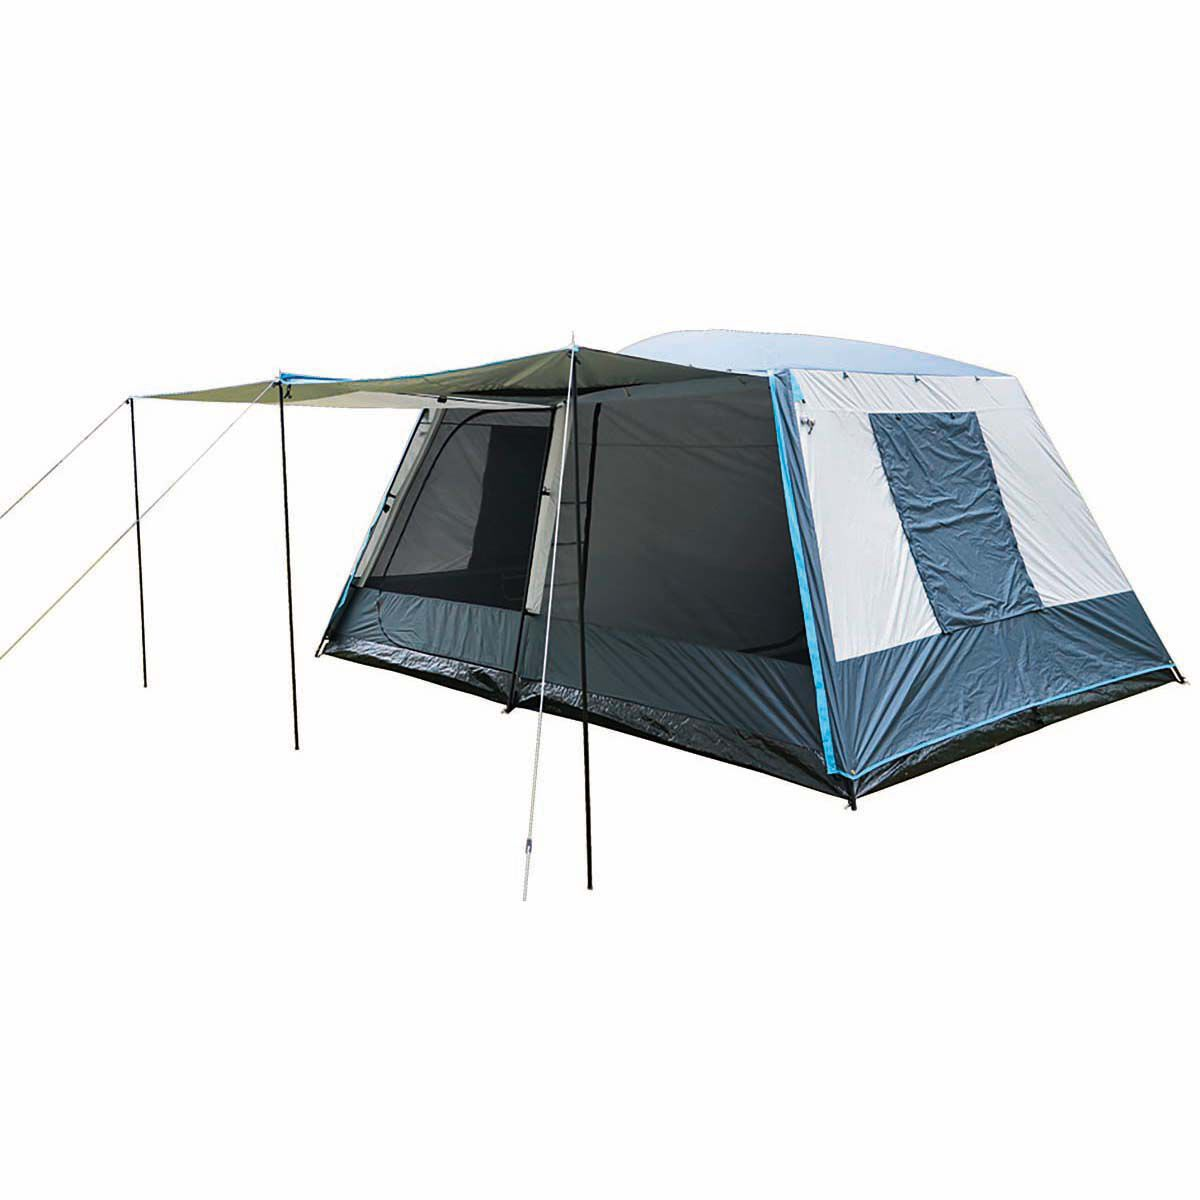 Wanderer Goliath II Dome Tent 10 Person  bcf_hi-res ...  sc 1 st  BCF Australia & Buy Camping Gear u0026 Accessories Online - BCF Australia